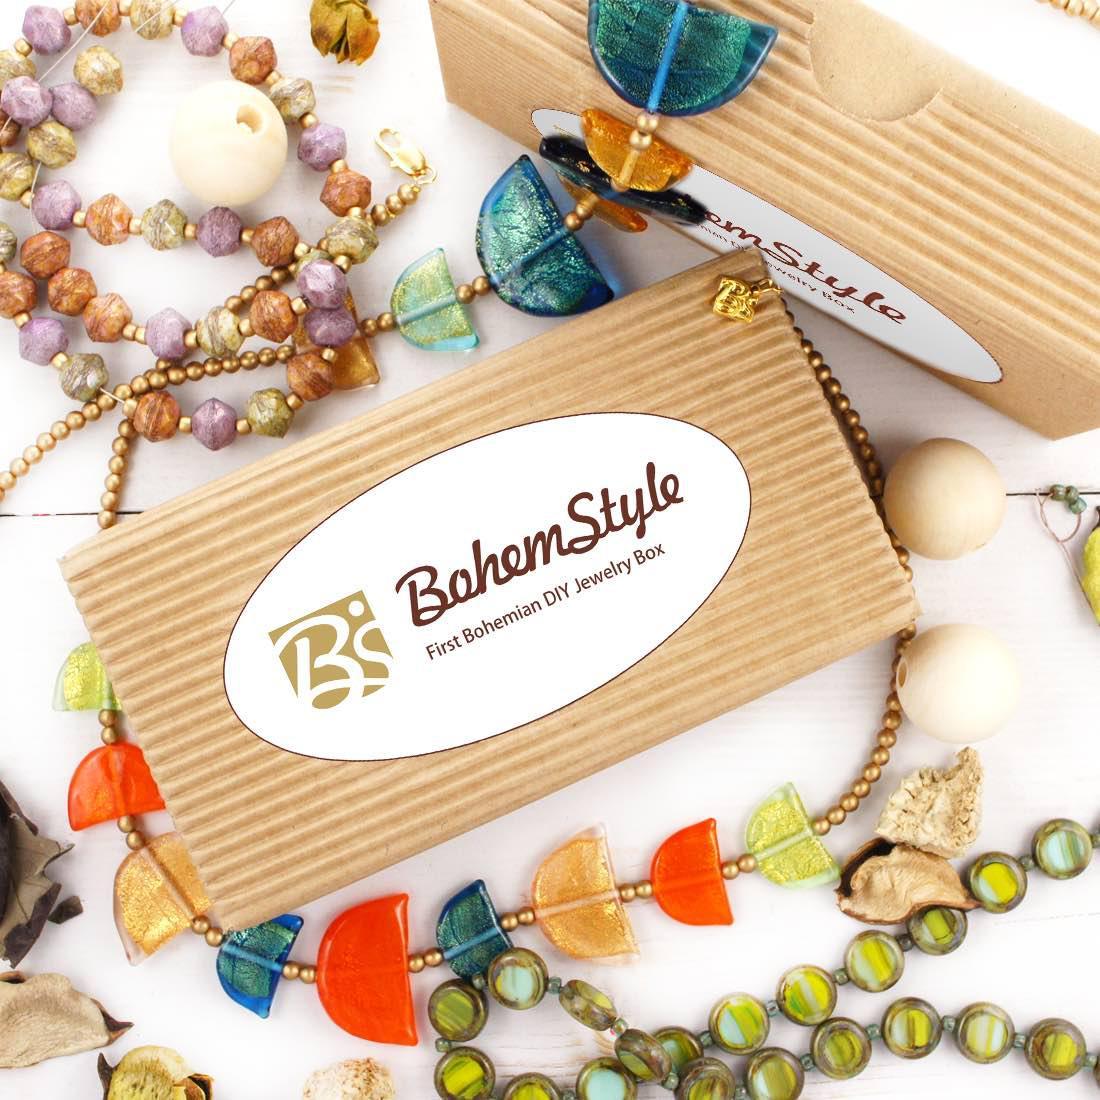 Bohemstyle Diy Jewelry Box Subscription